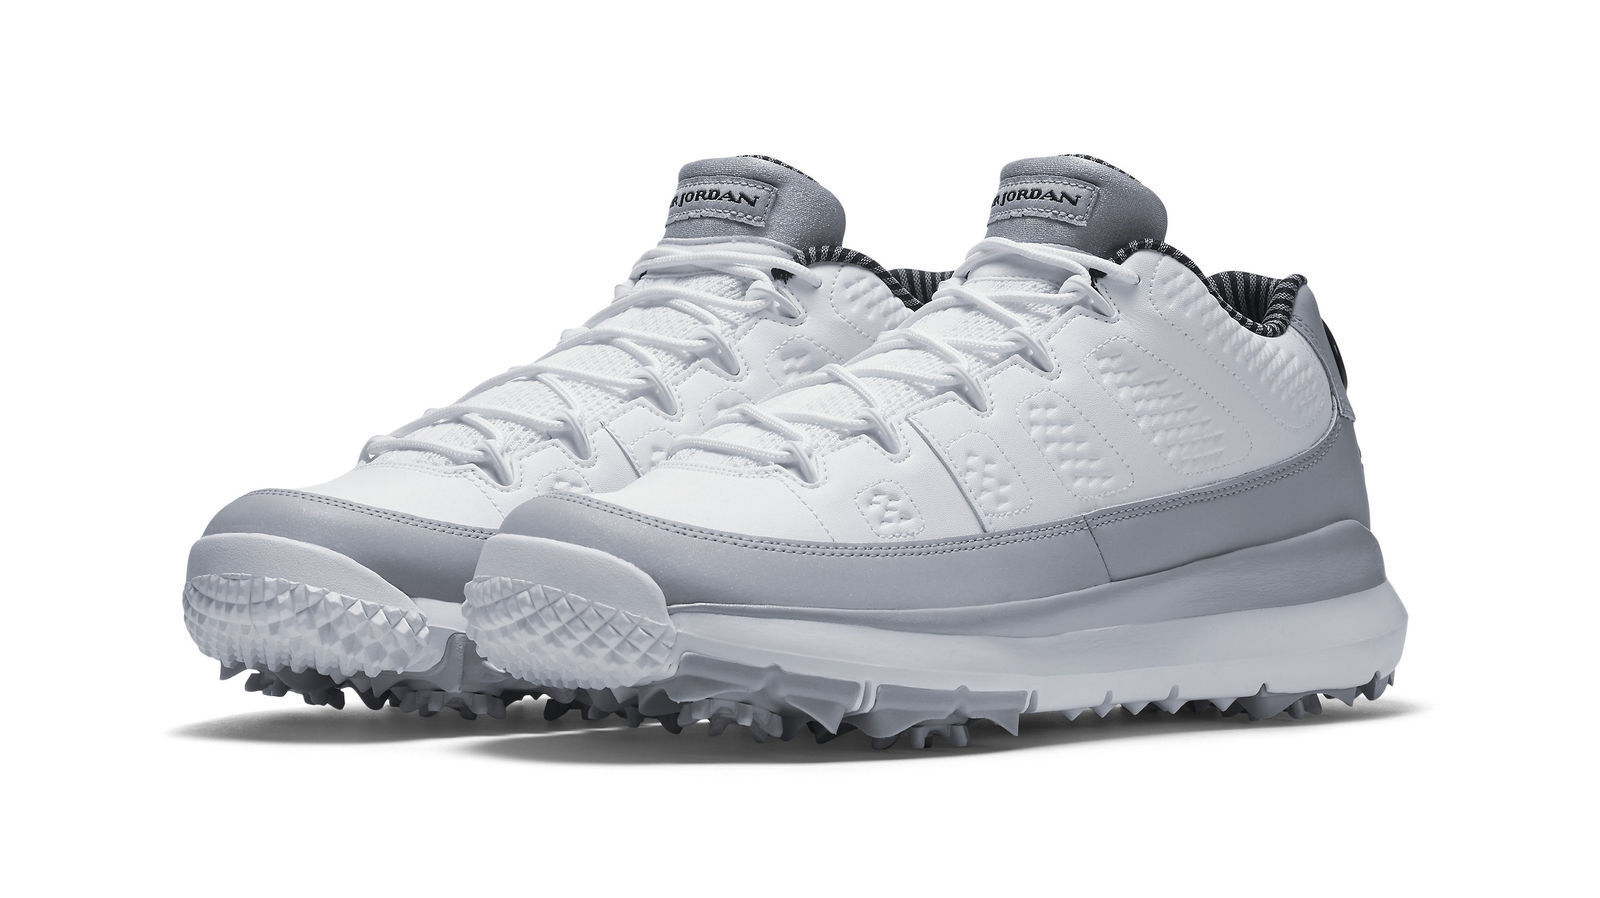 95b2747f3757a5 Size 9.5 Men Nike Air Jordan 9 IX Retro Golf Shoes Barons White Grey ...